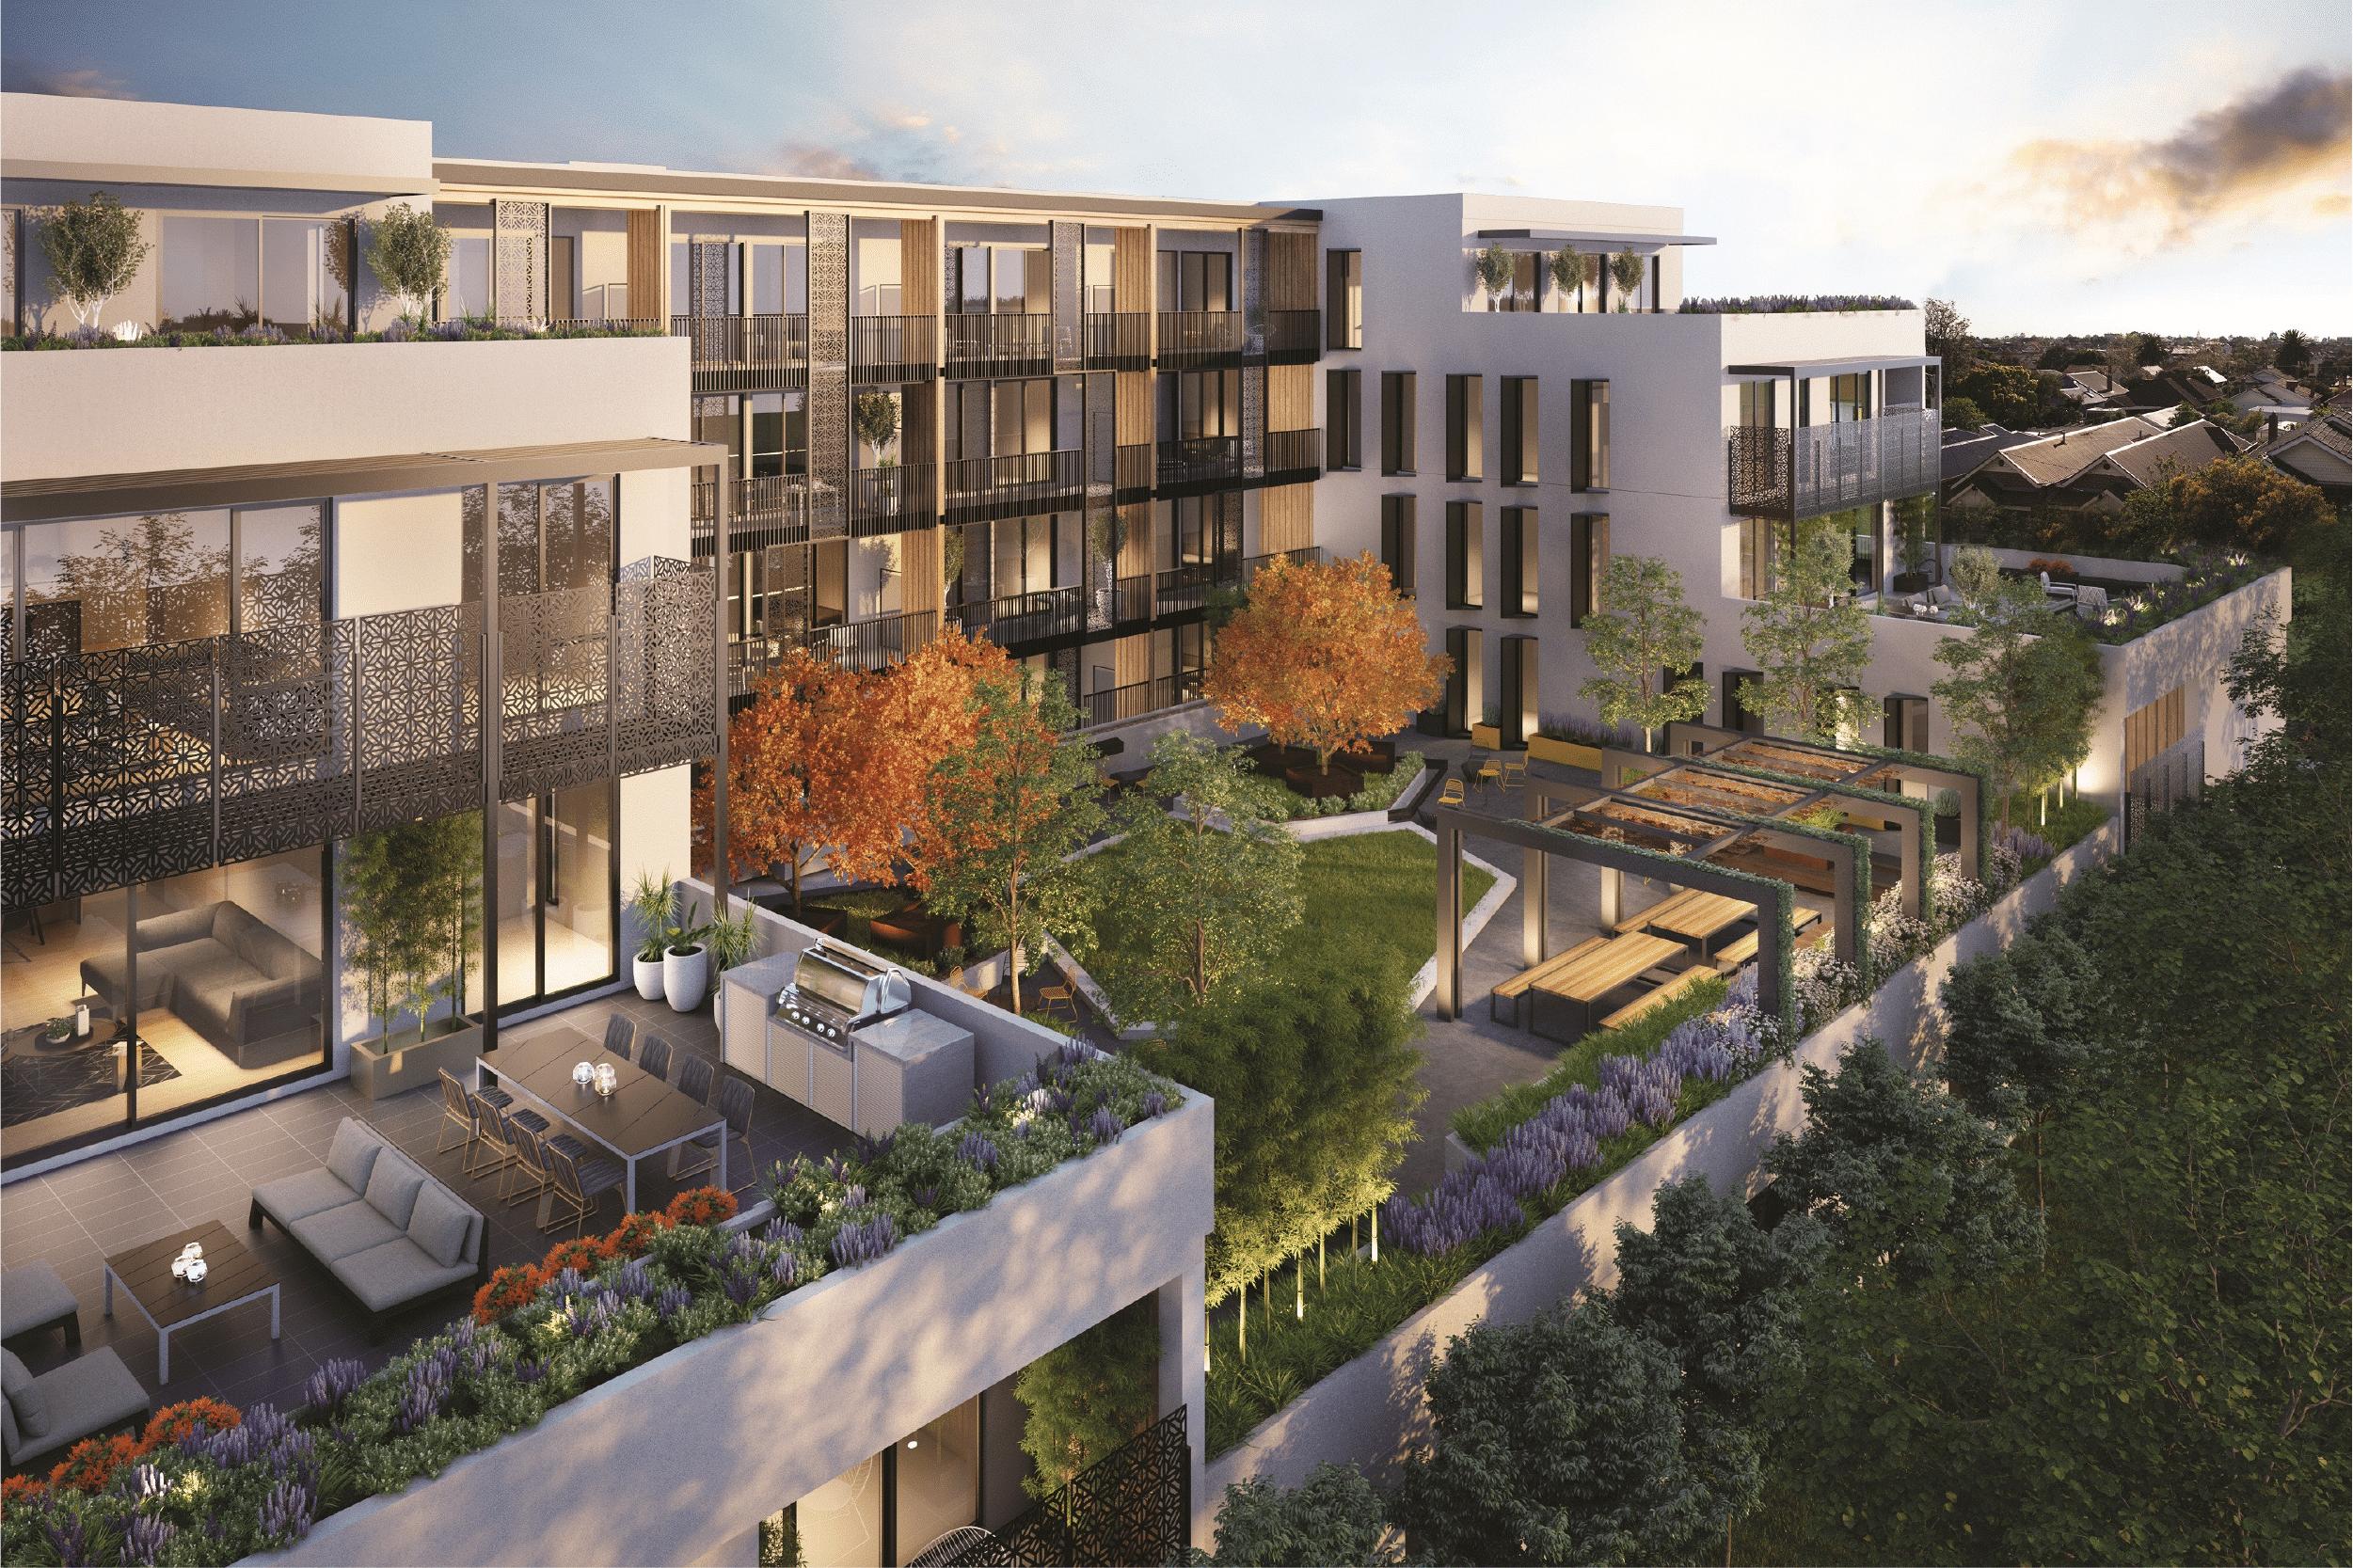 Birdseye view of apartment complex